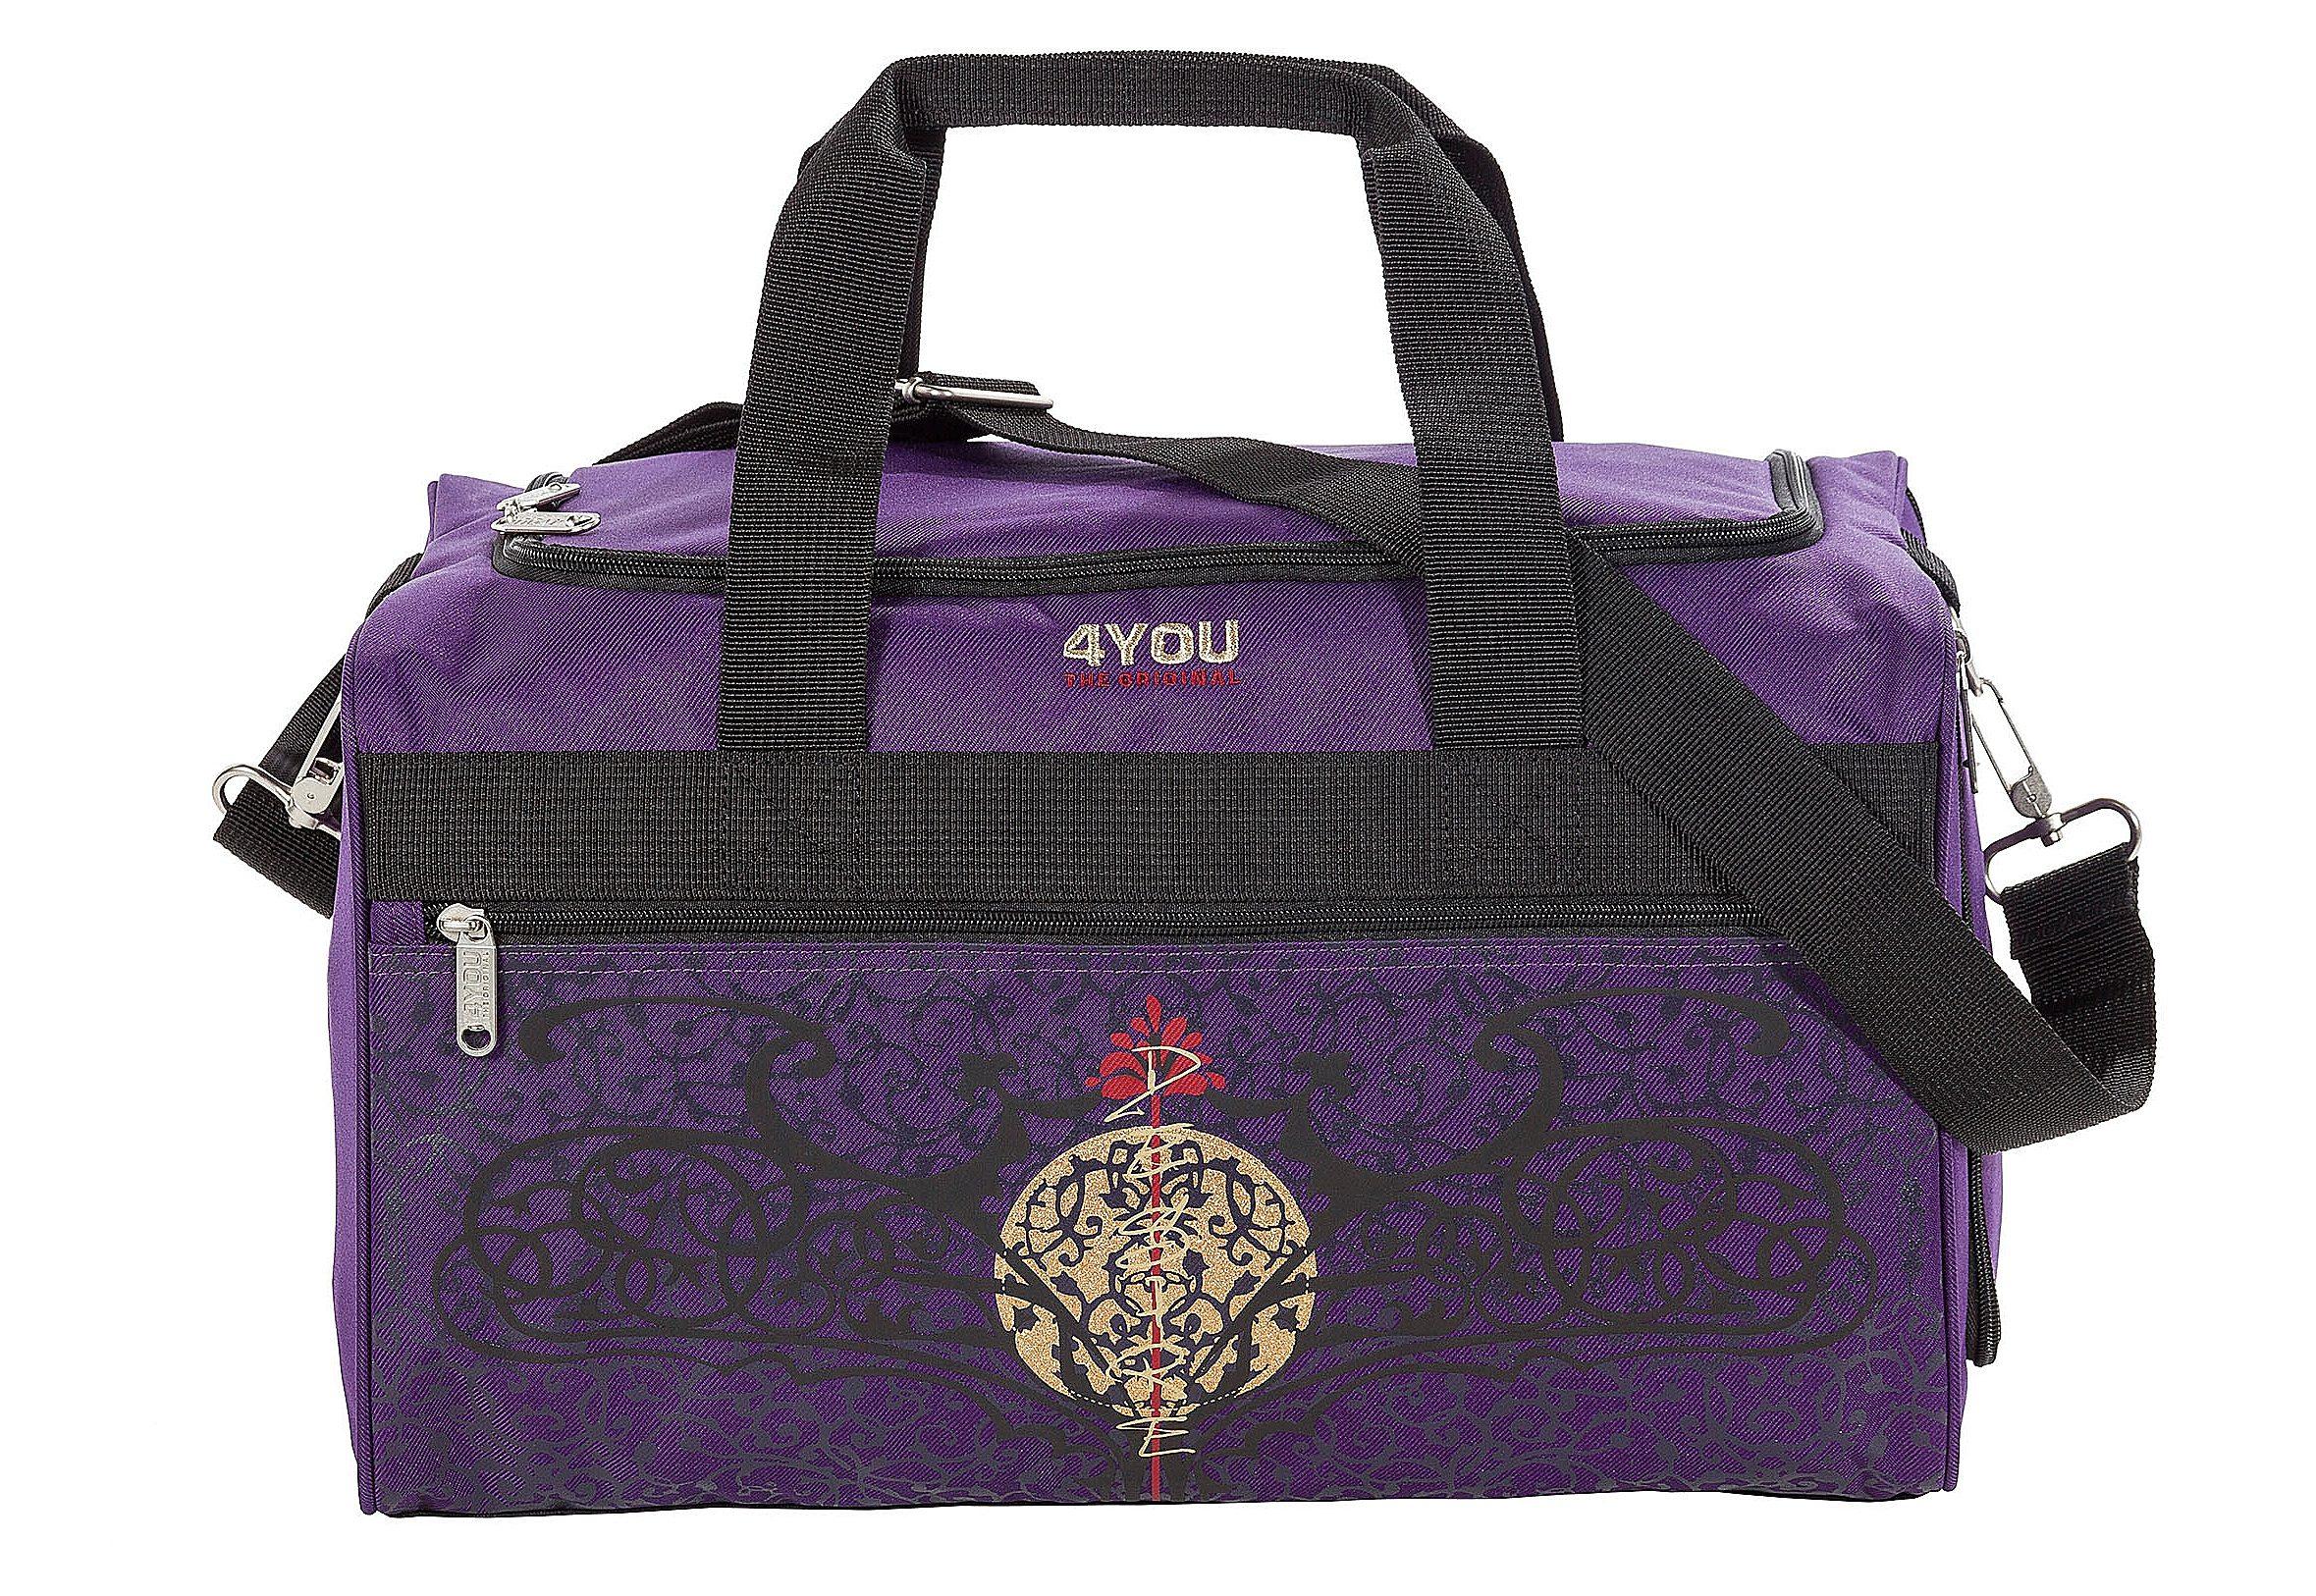 Sportbag Gothic-Motiv auf lila, »Sporttasche M«, 4You